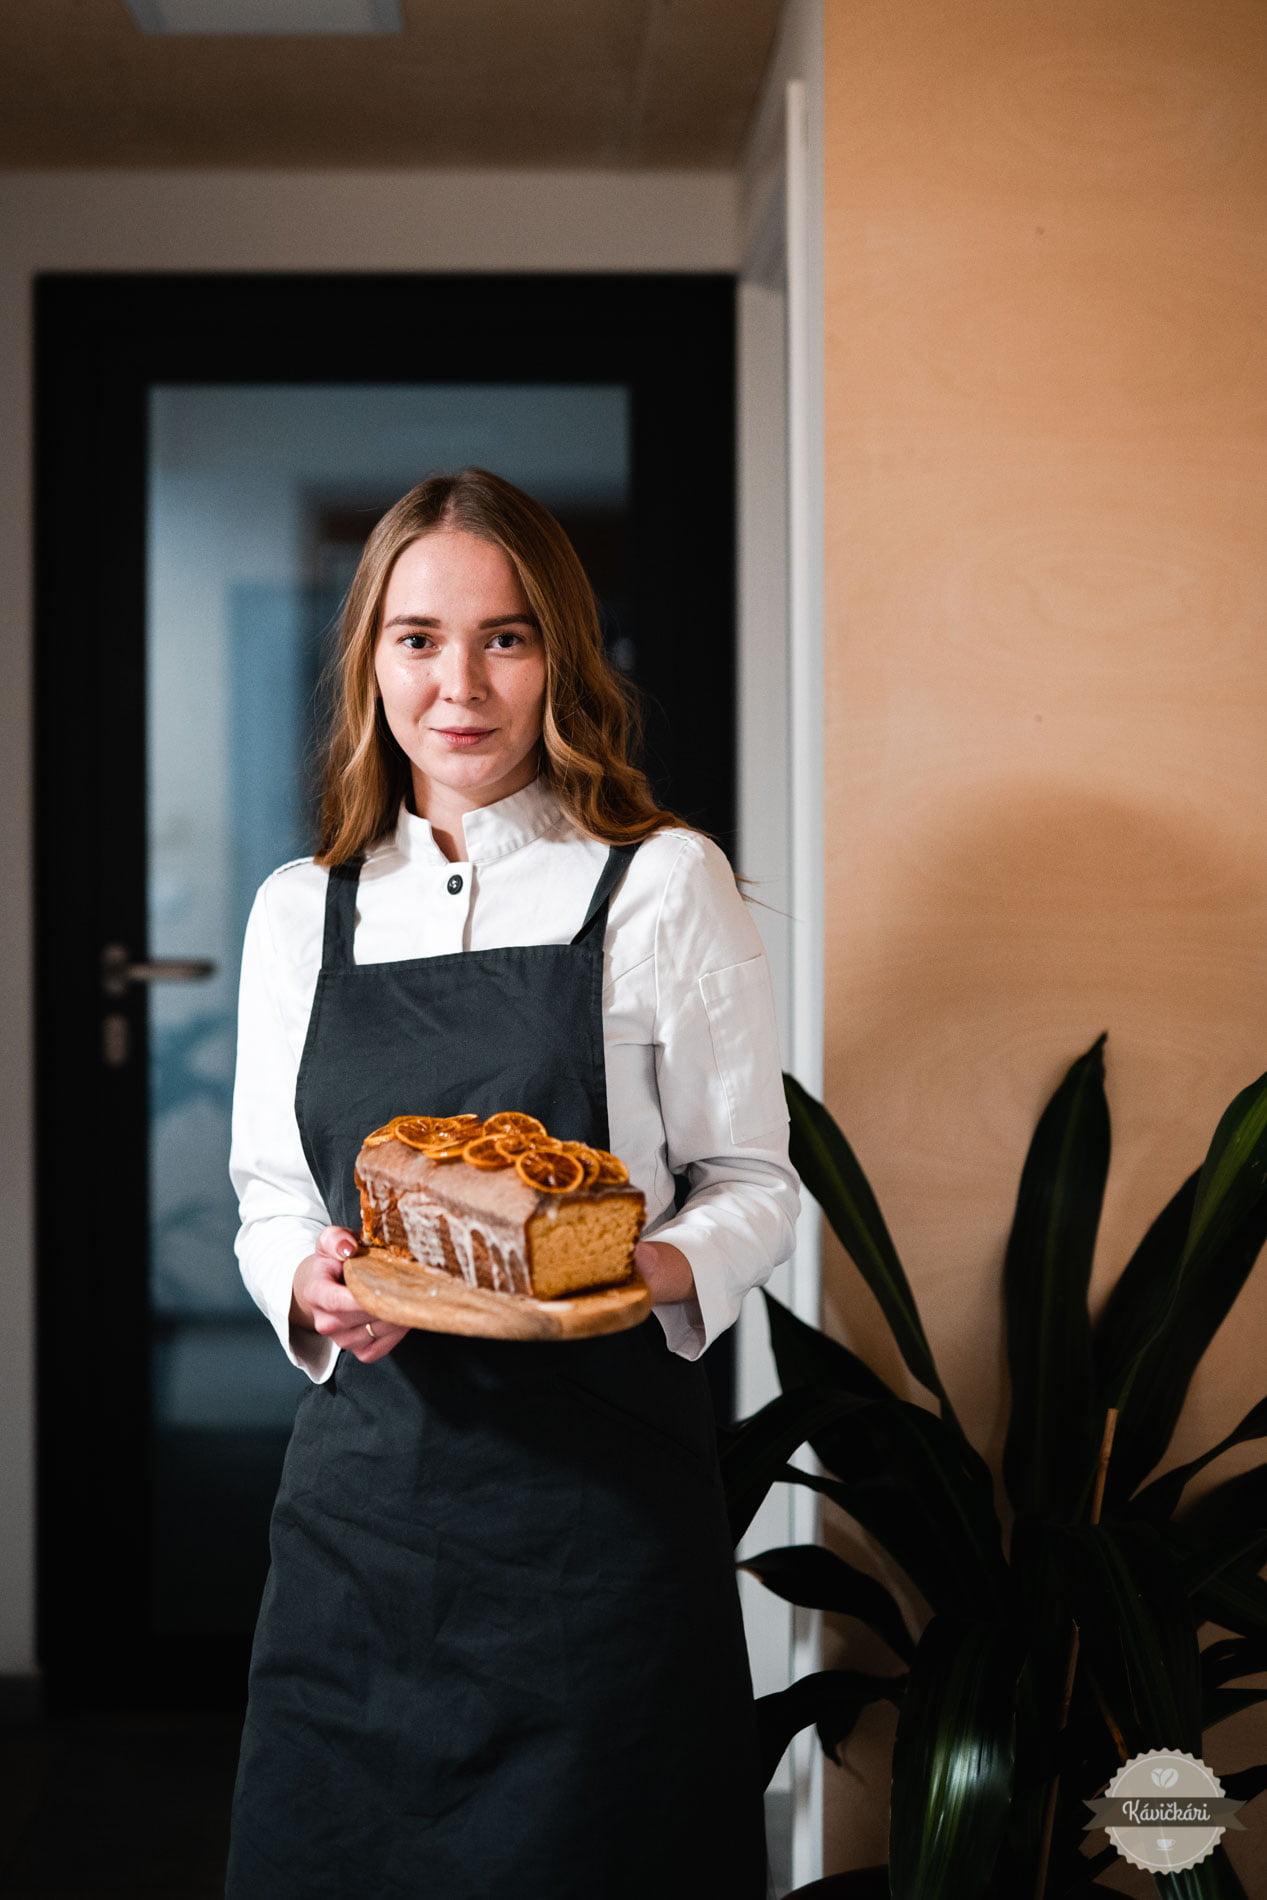 alena-vasileva-bottova--banska-bystrica-chlebik-kavickarisk